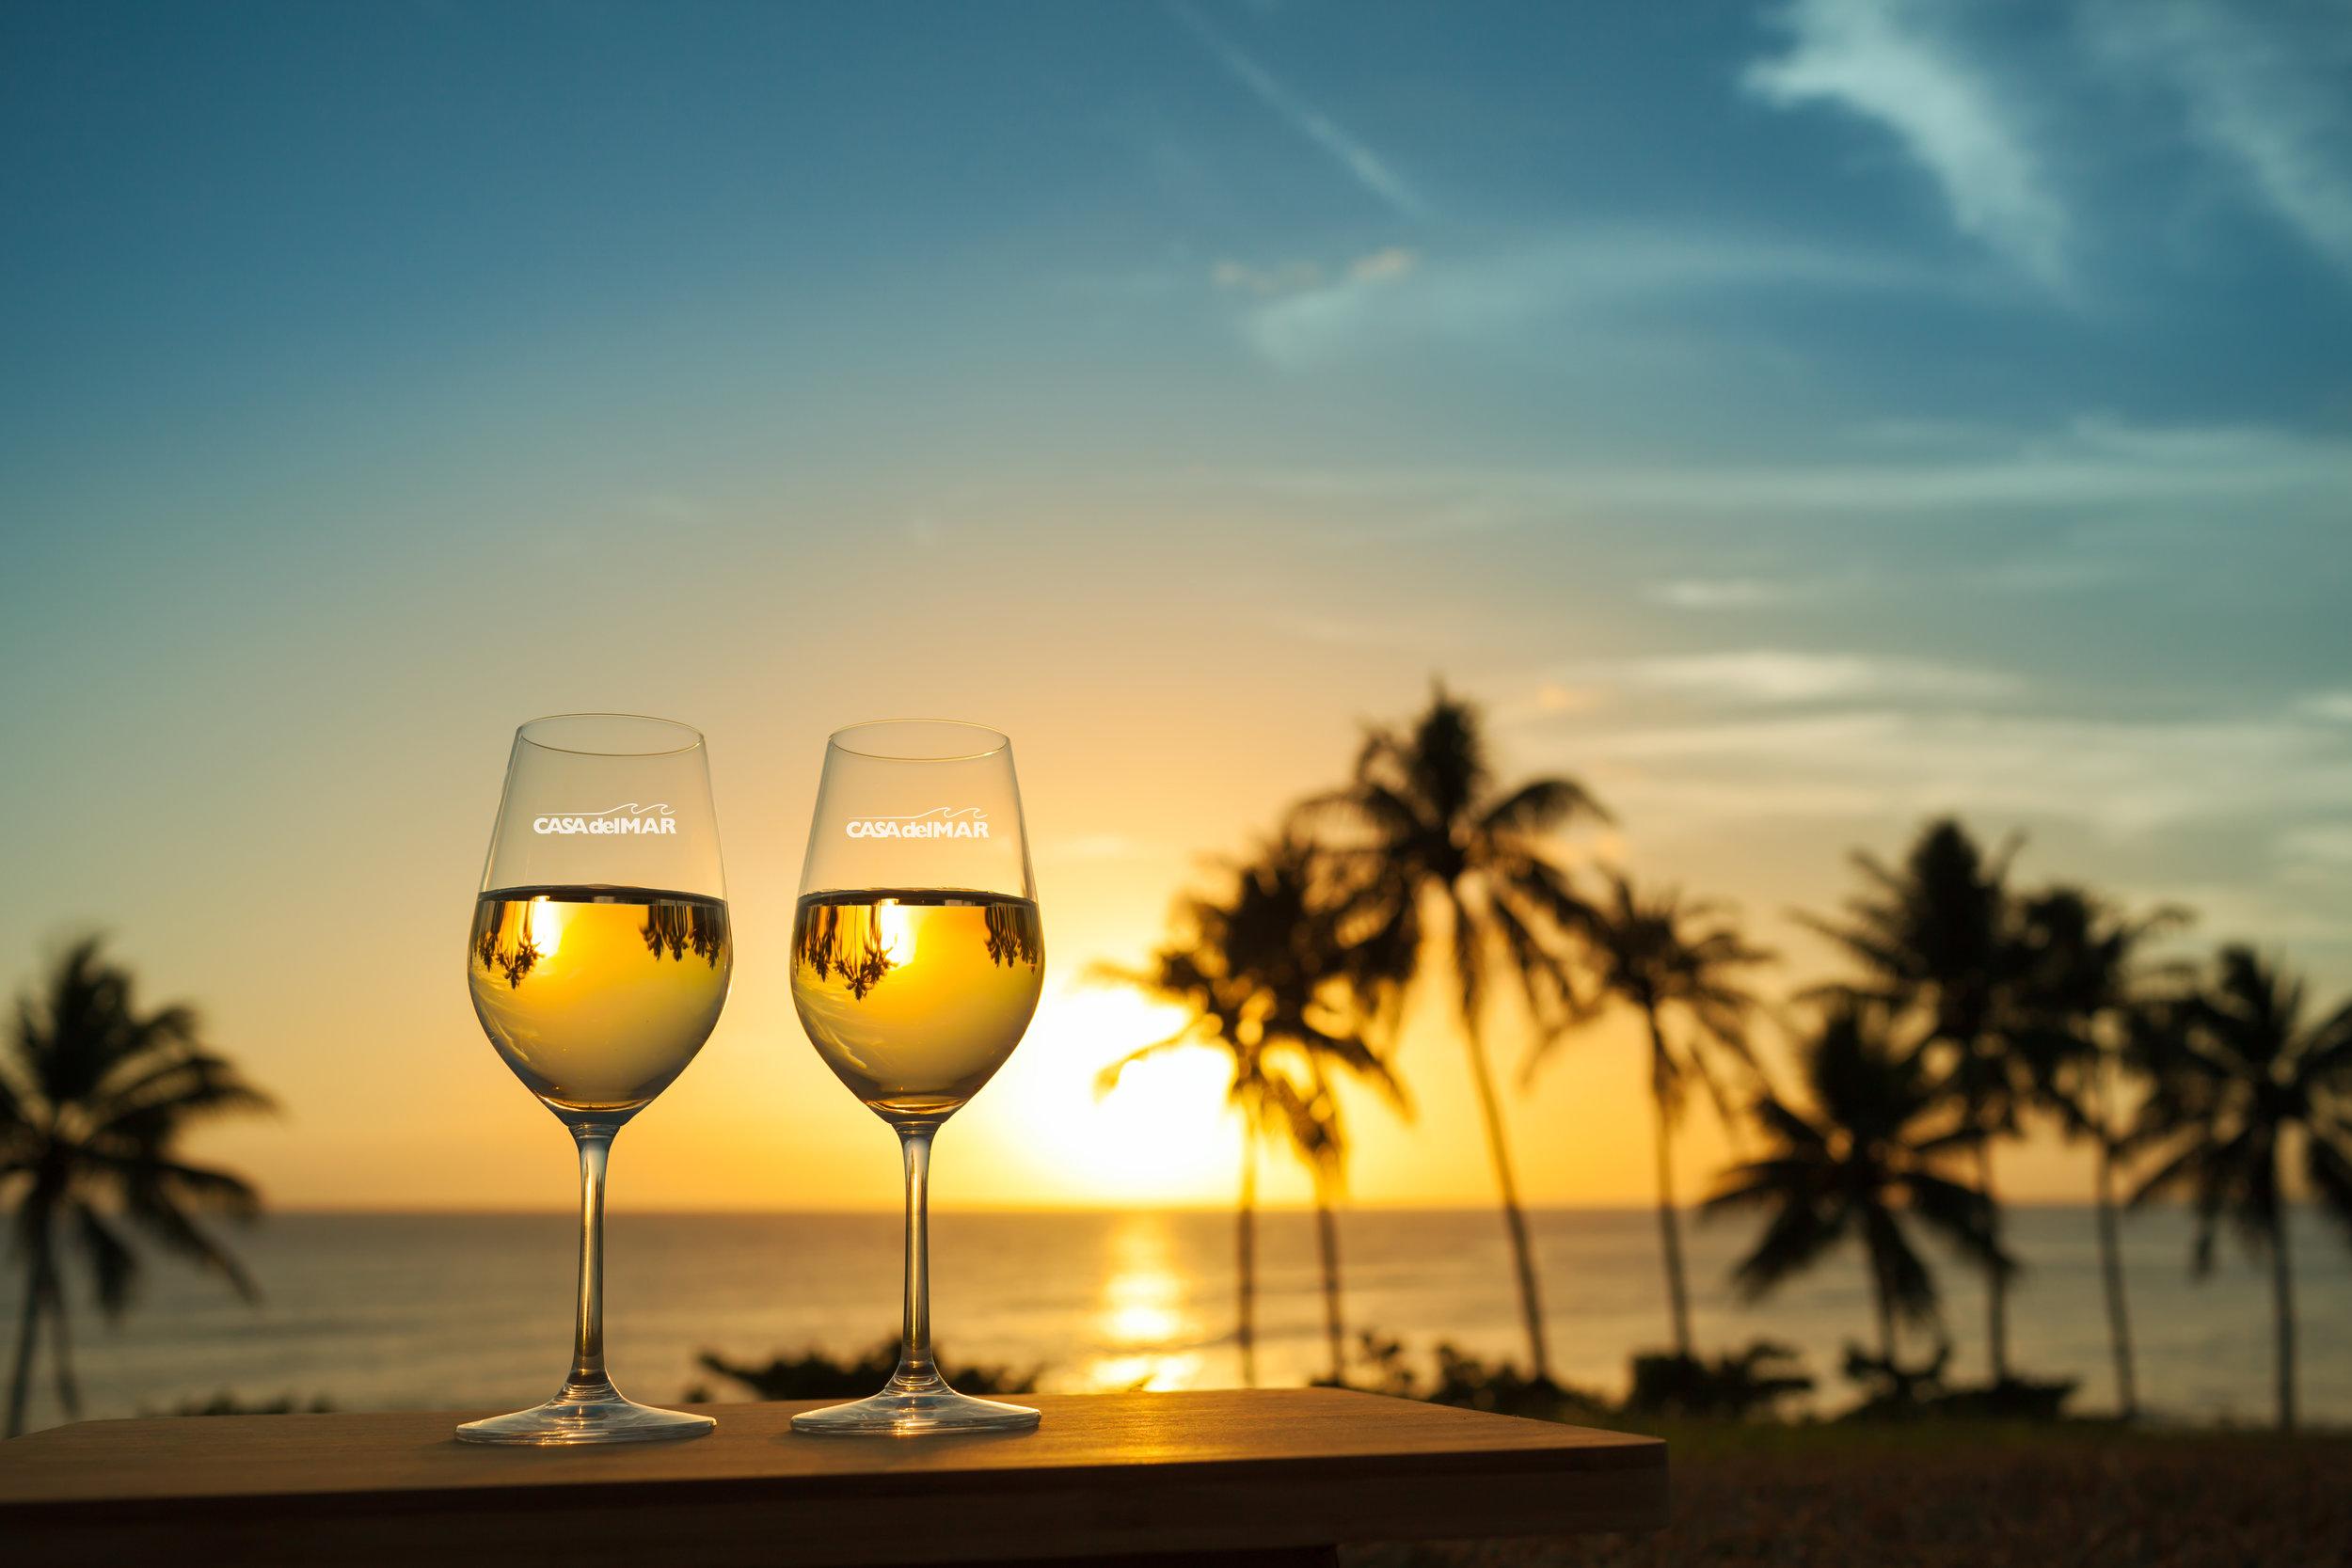 logo wine glasses, logo barware, personalized glasses, personalized wine glasses, custom wine glasses, custom drinkware